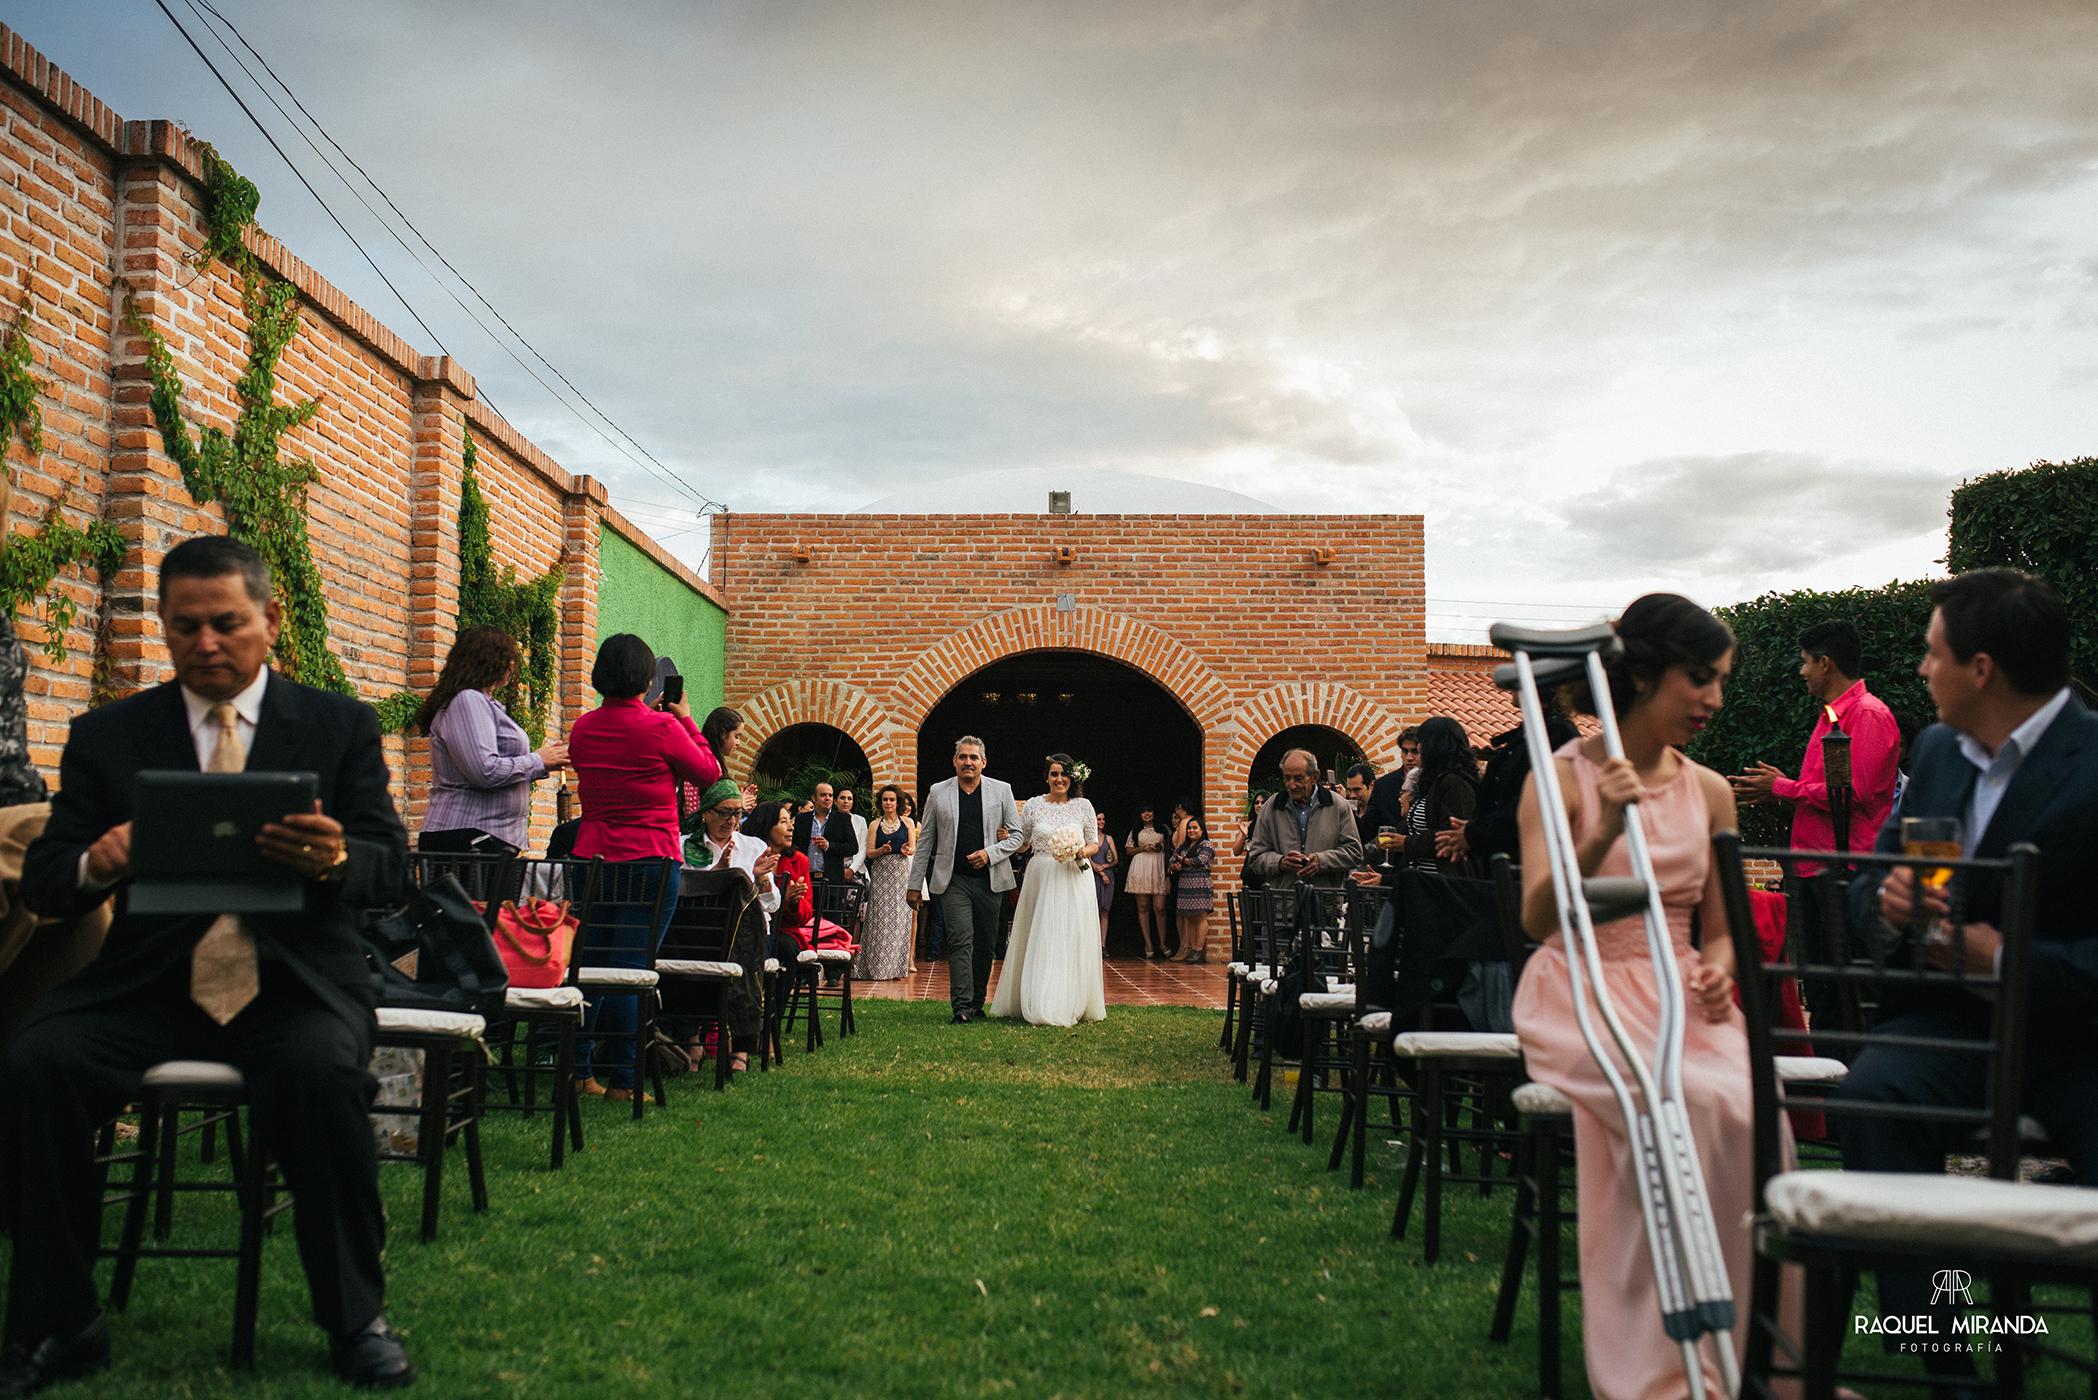 raquel miranda fotografía | boda civil| paulina&benjamin-3a.jpg